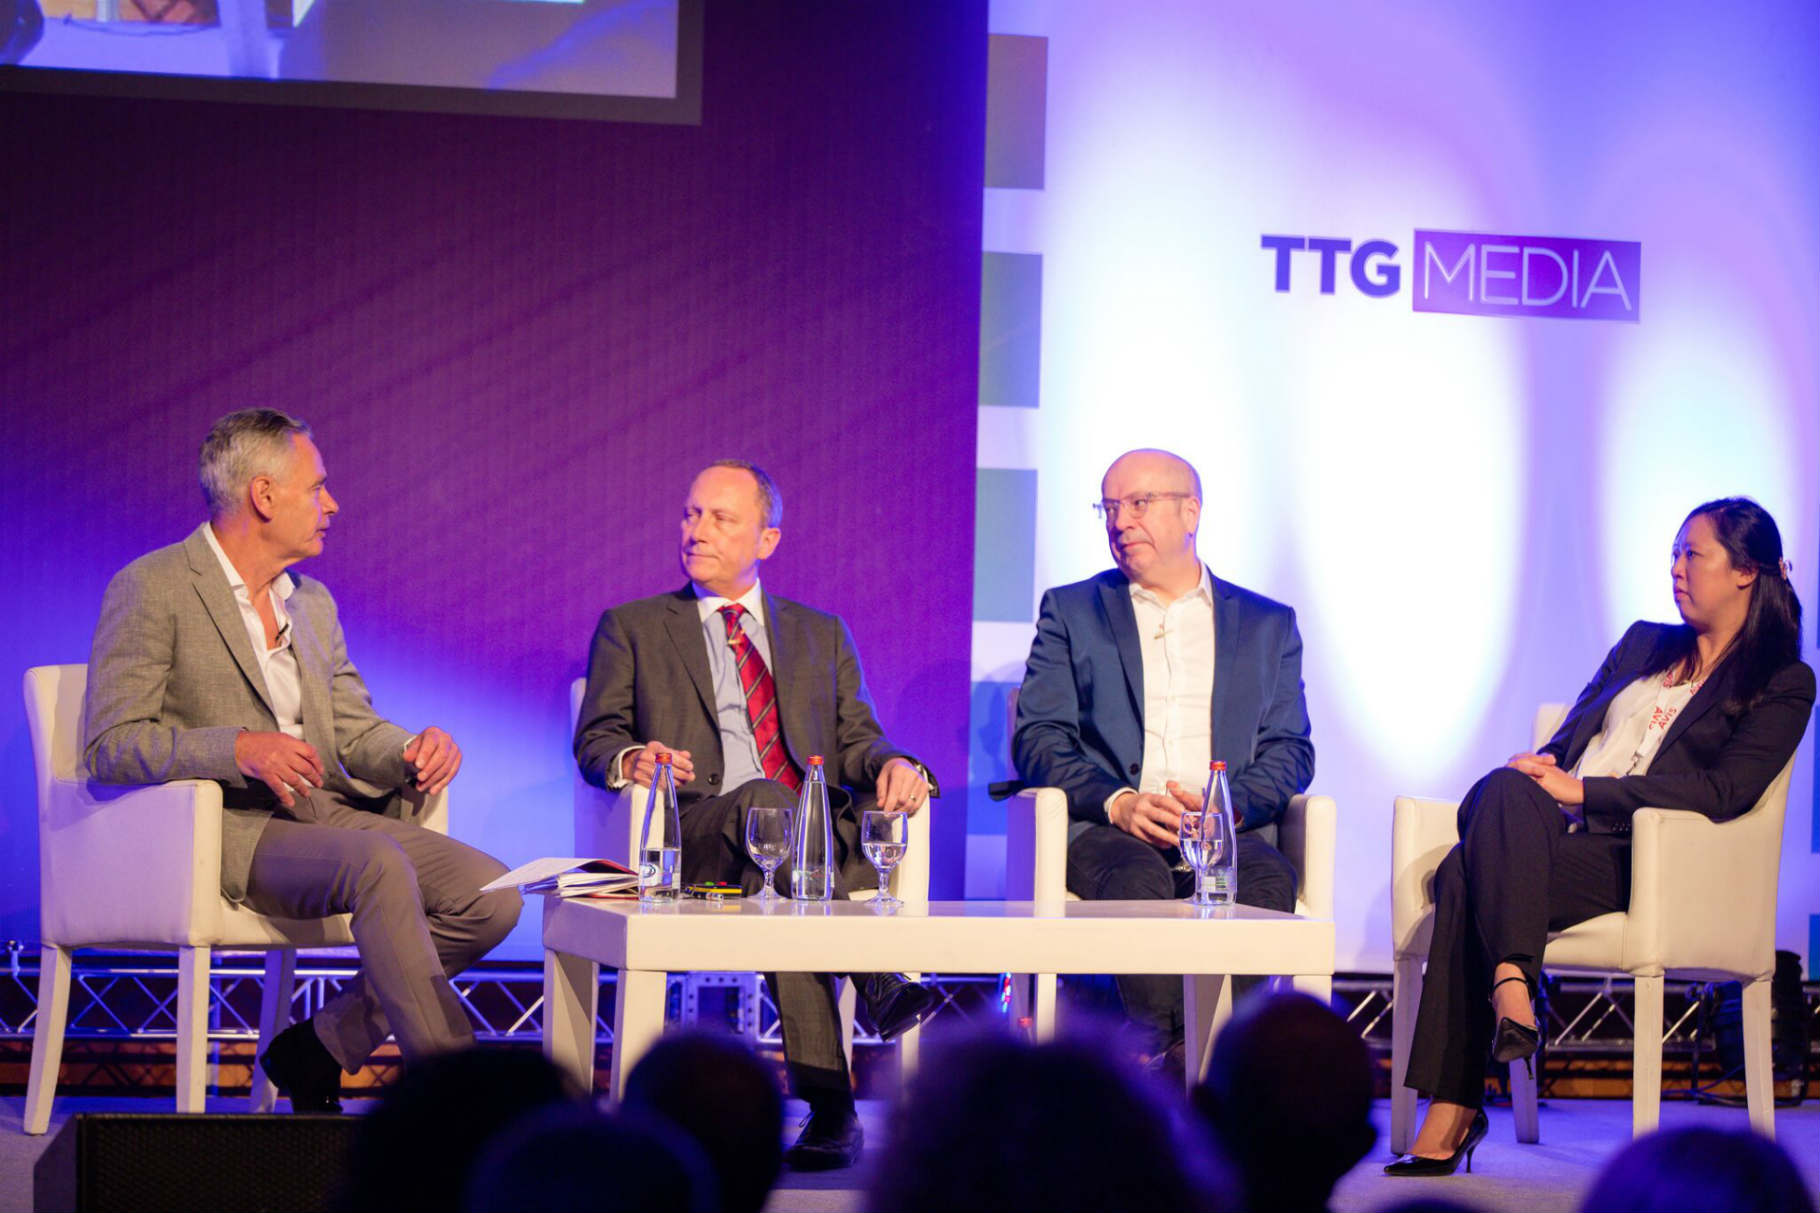 Richard Carrick Talking at Conference